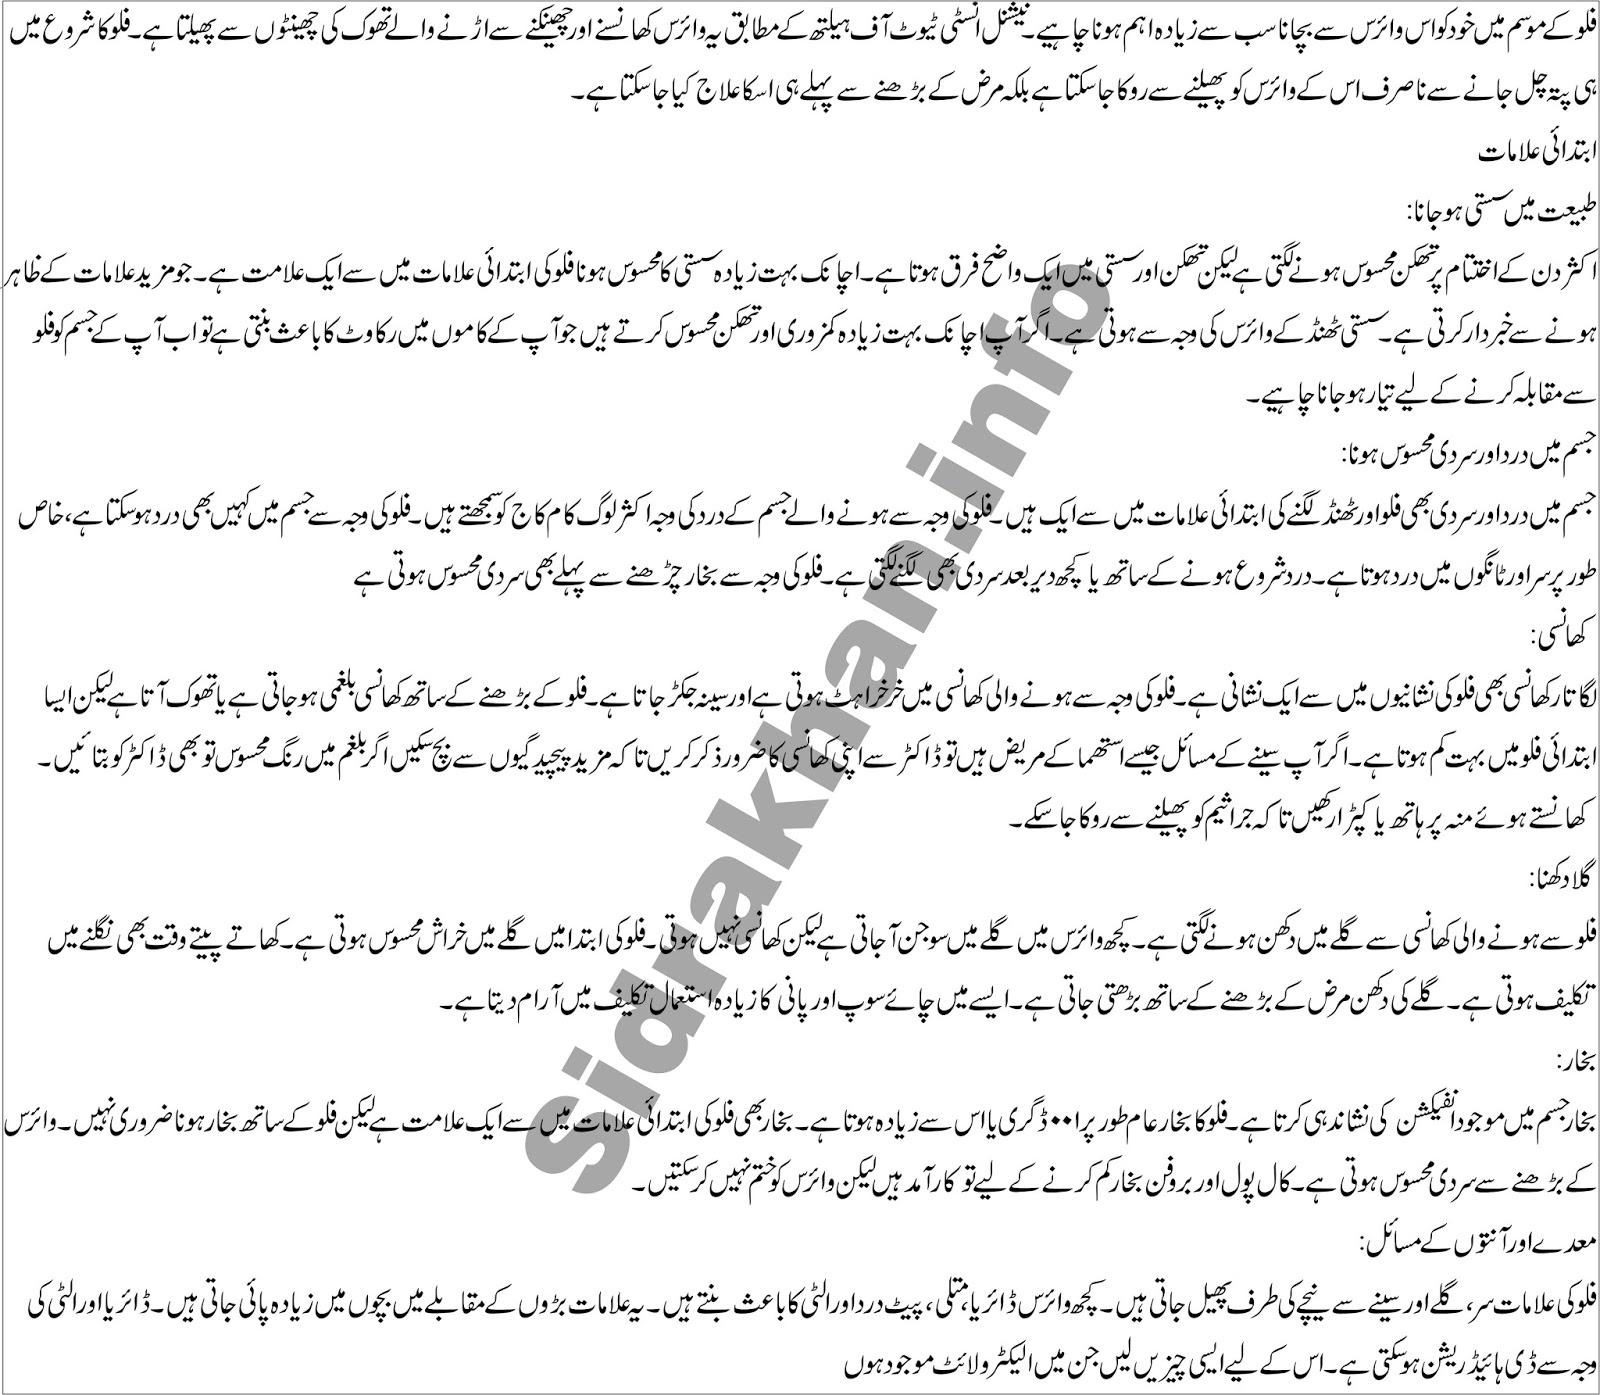 Symptoms of Flu  in Urdu